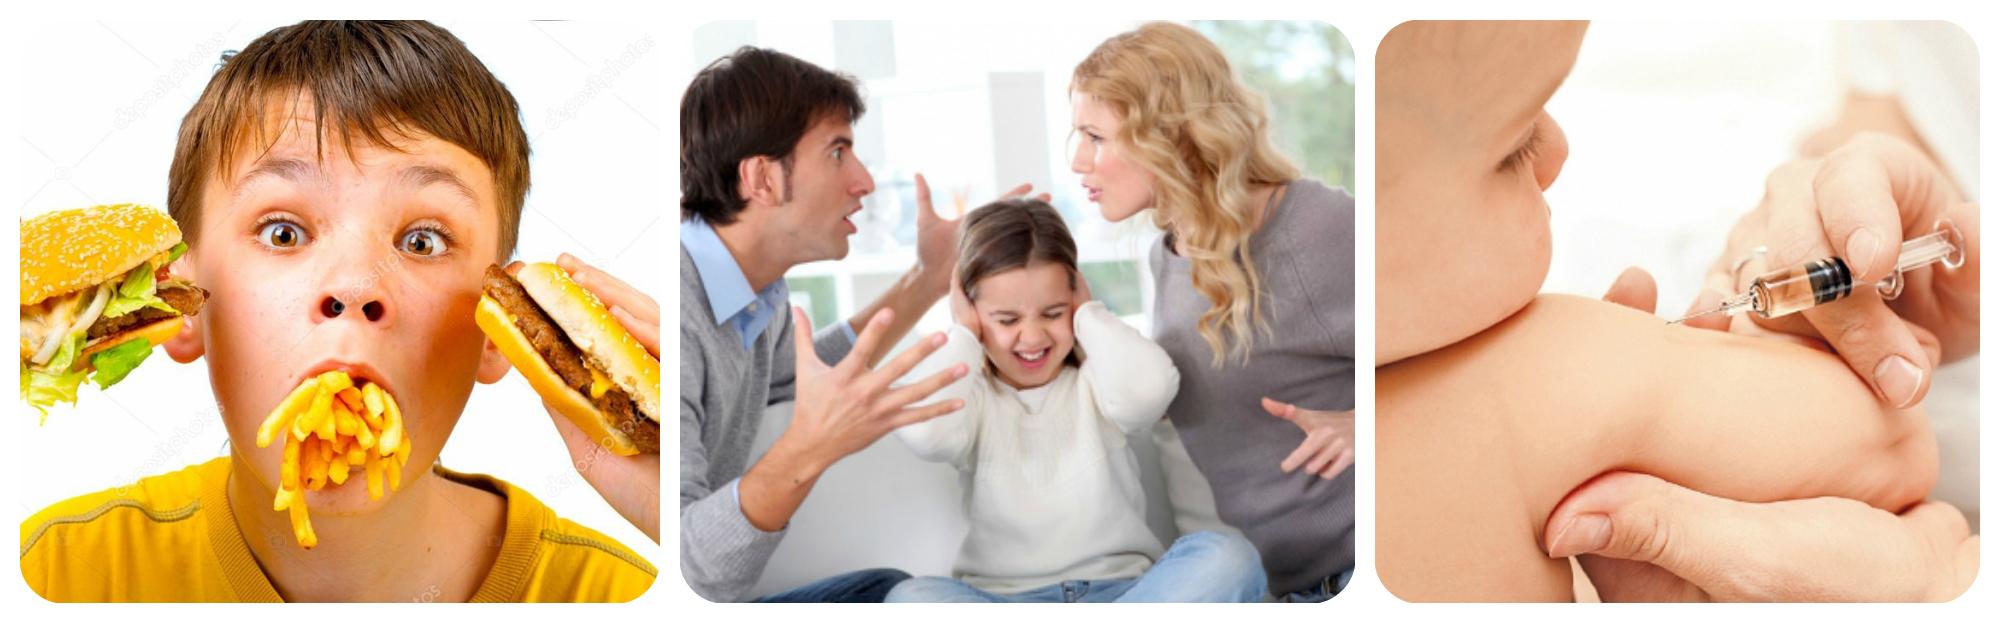 ссоры родителей, фаст-фуд, вакцинация